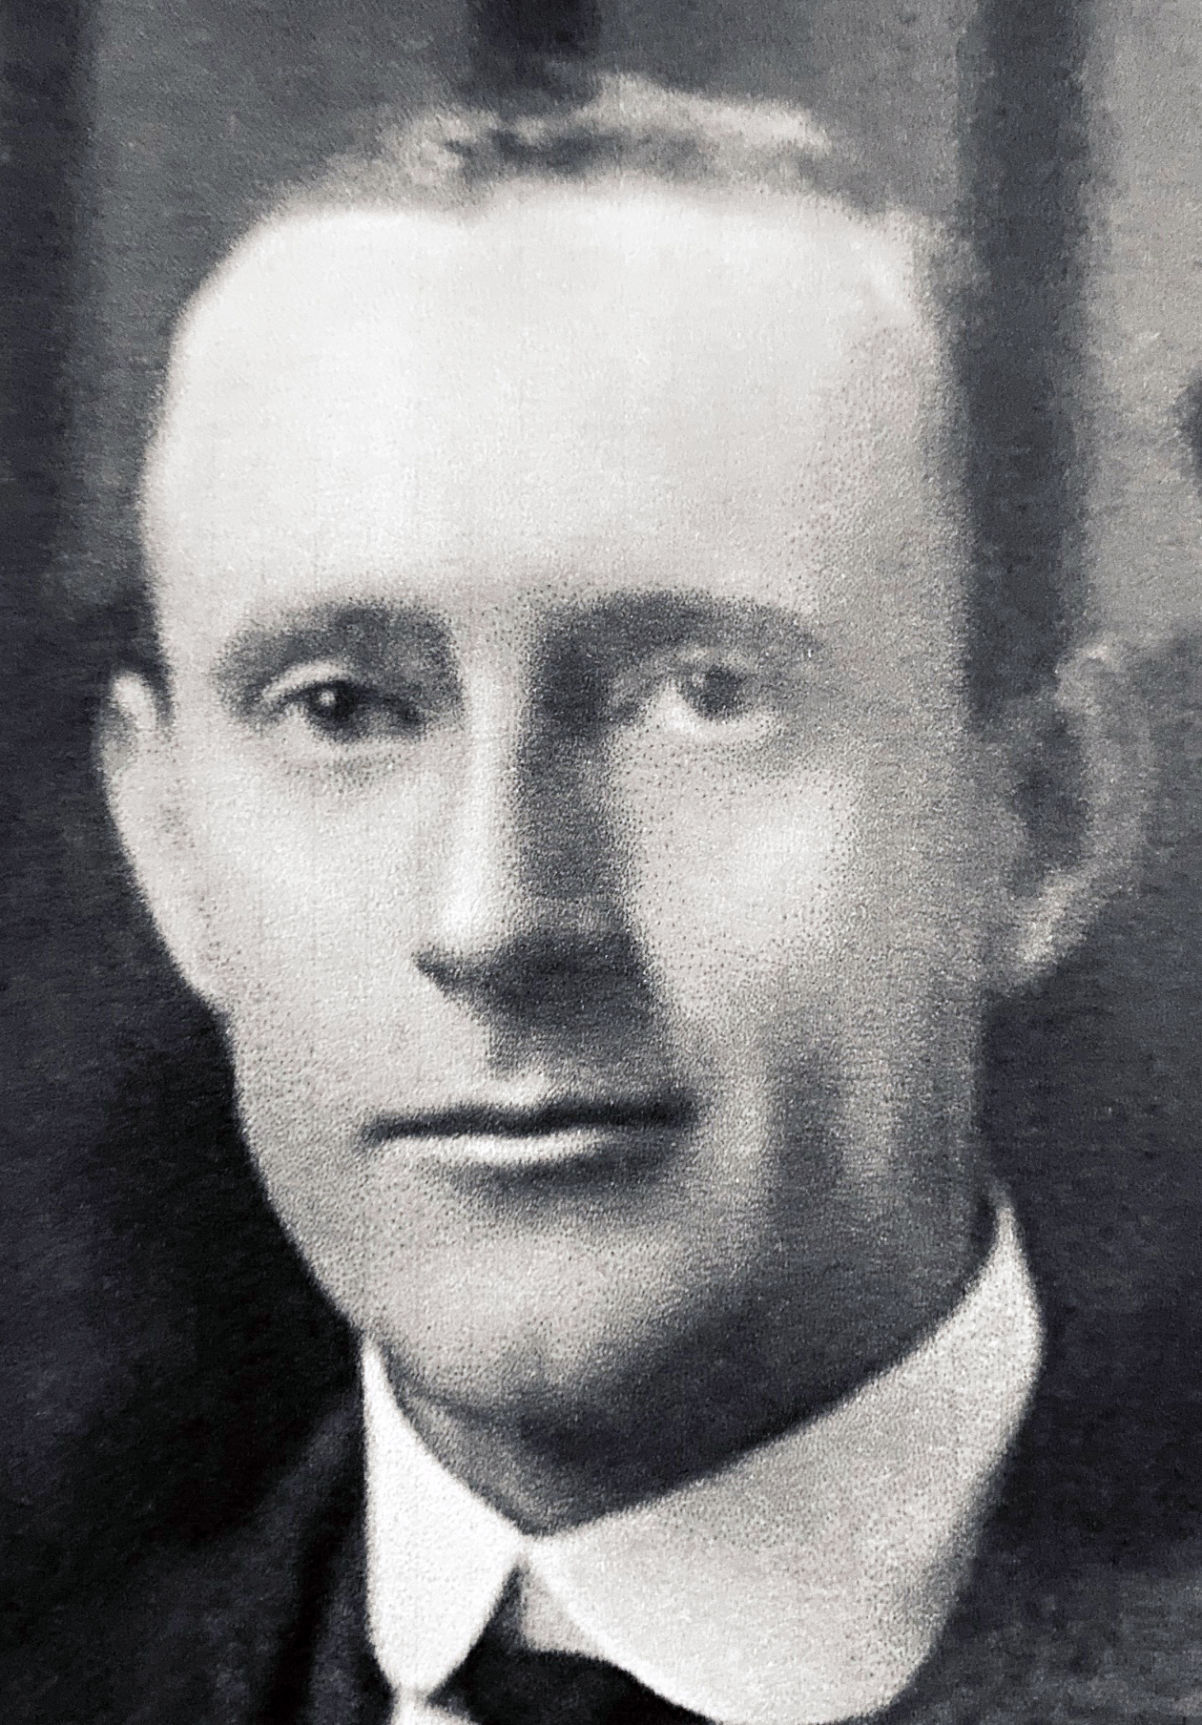 Attorney Paul D. Thomas